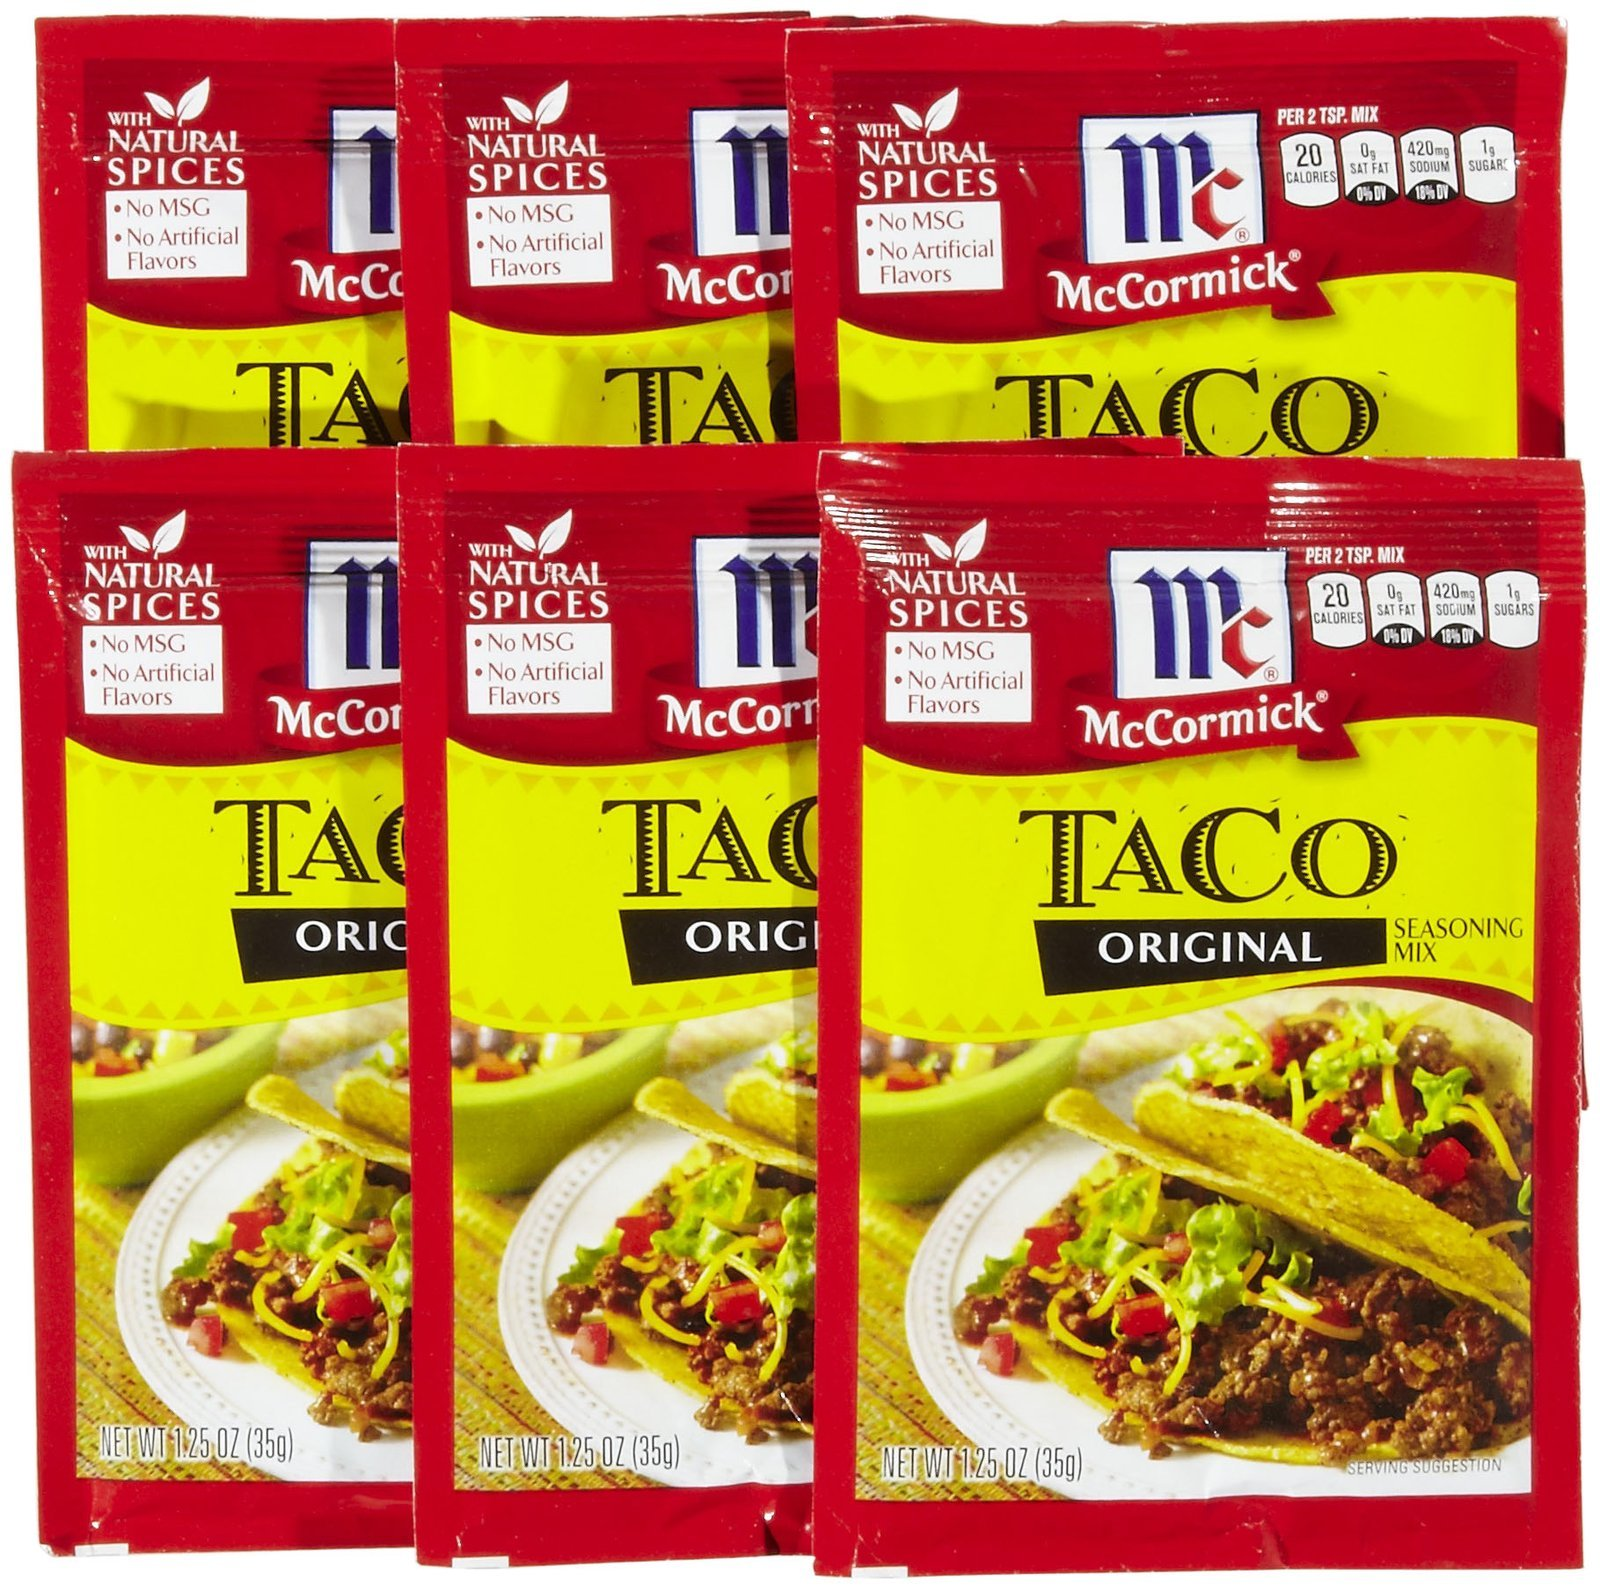 Mccormick S Original Taco Seasoning Mix 35g Pack Of 1 Buy Online In Faroe Islands At Faroe Desertcart Com Productid 50866341